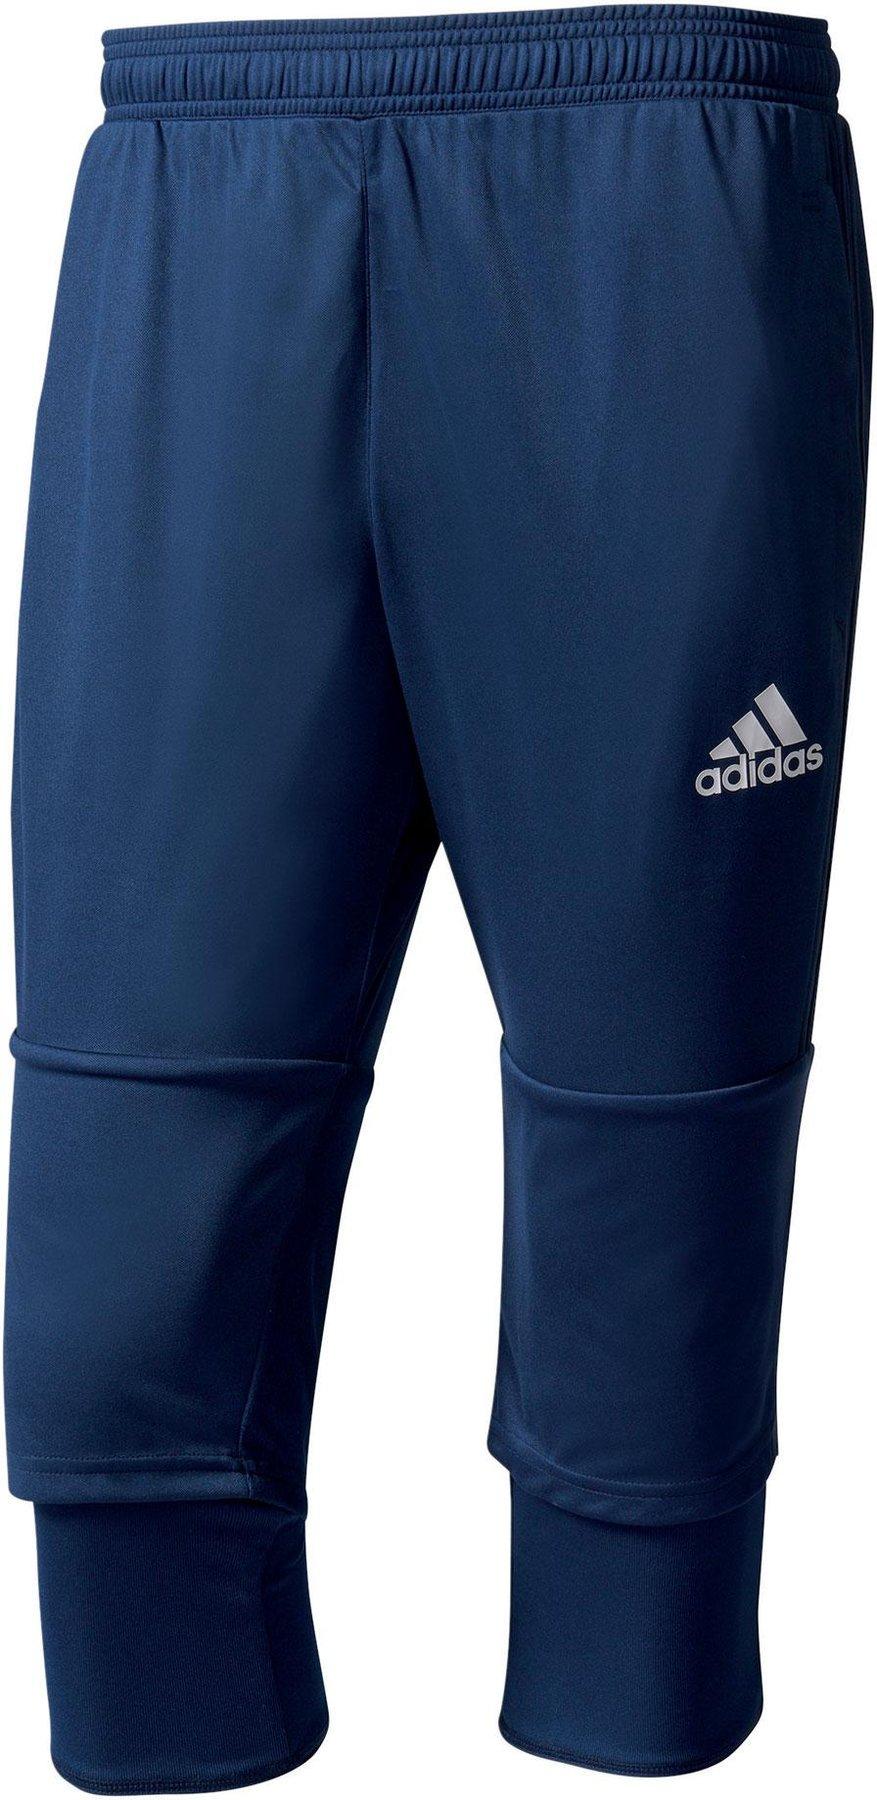 Adidas Sporthose Herren